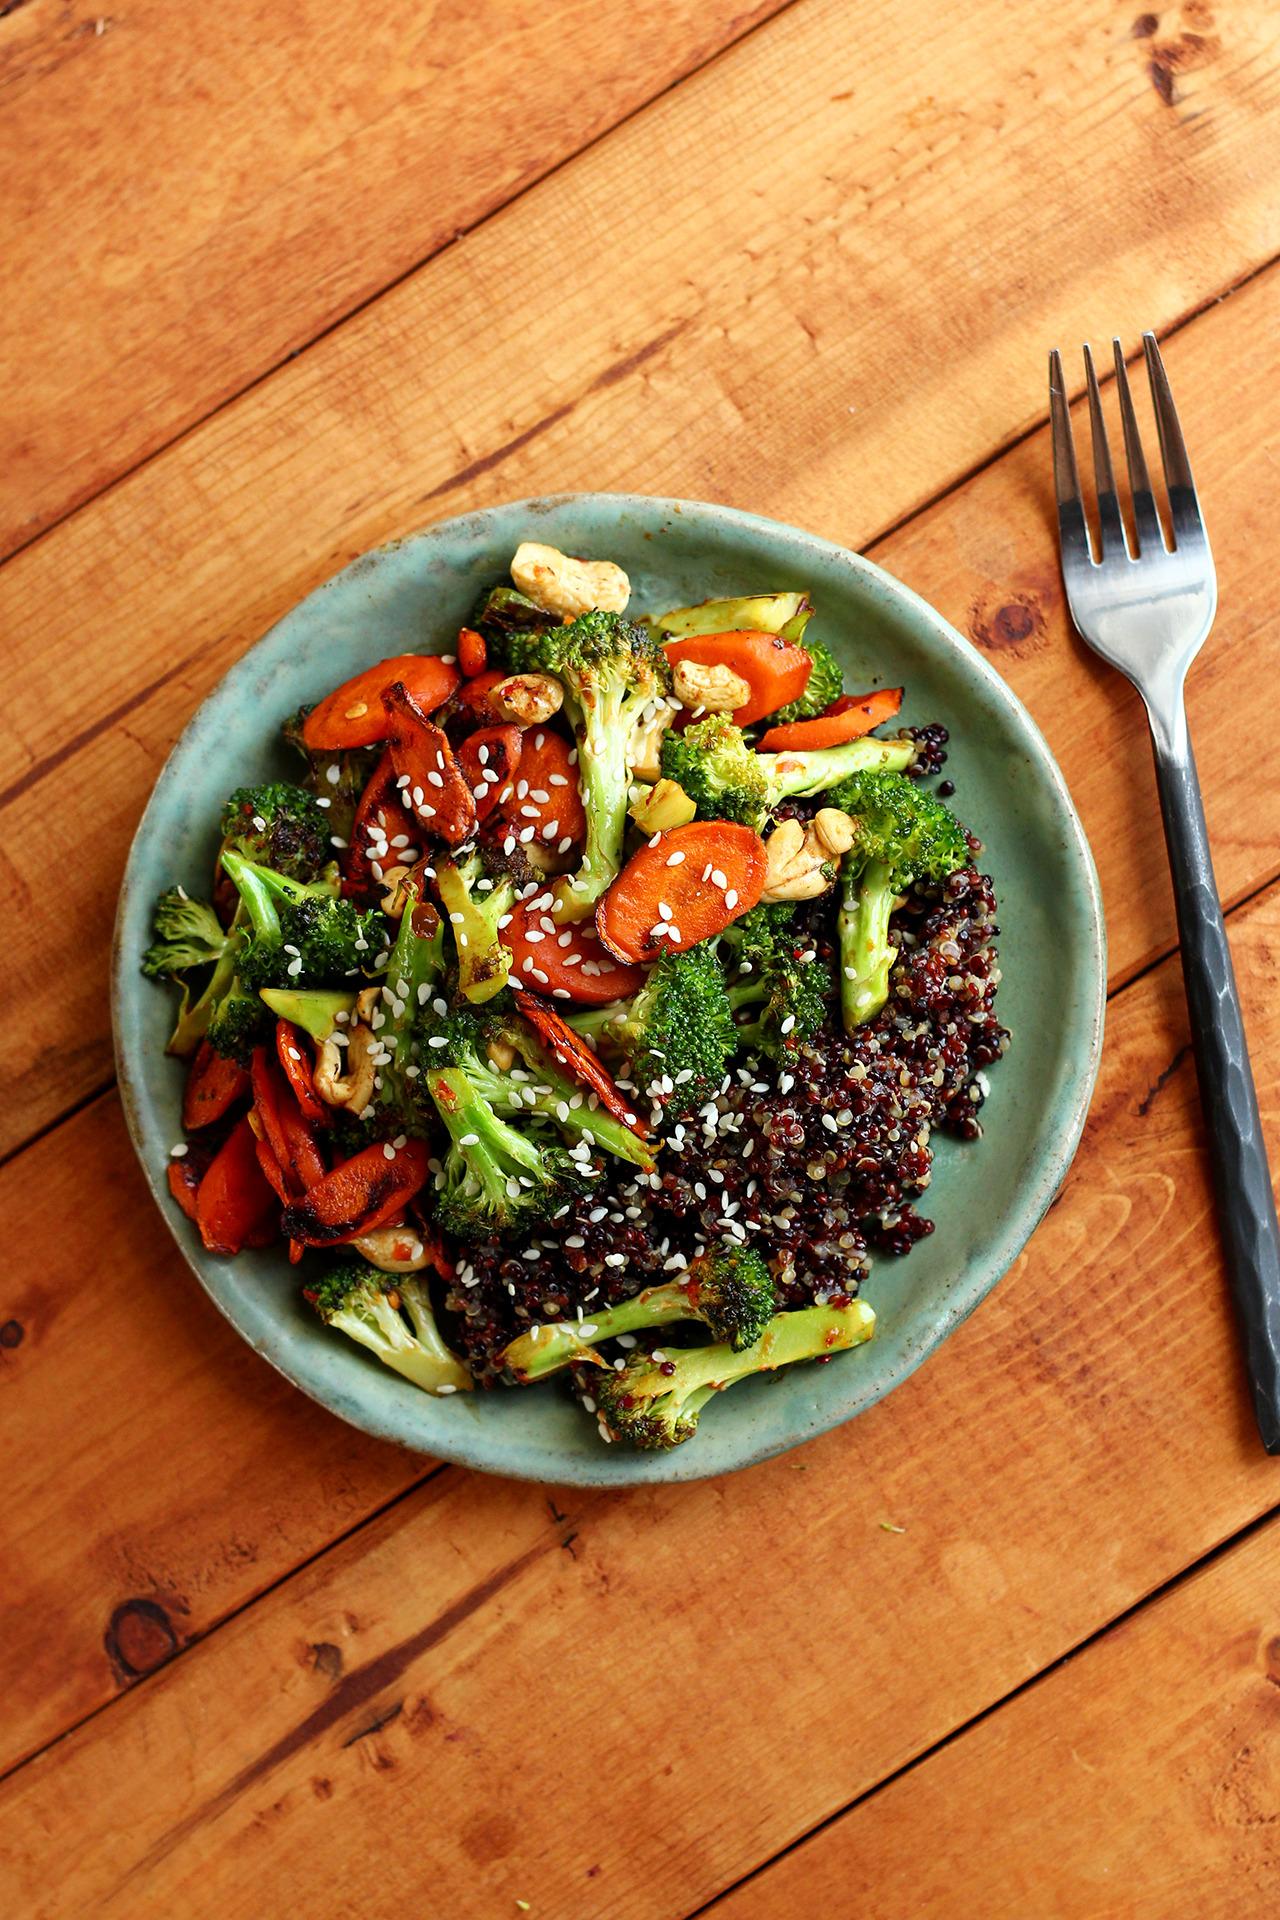 Stir-fried broccoli, carrots, mushrooms (seasoned with sriracha and ...